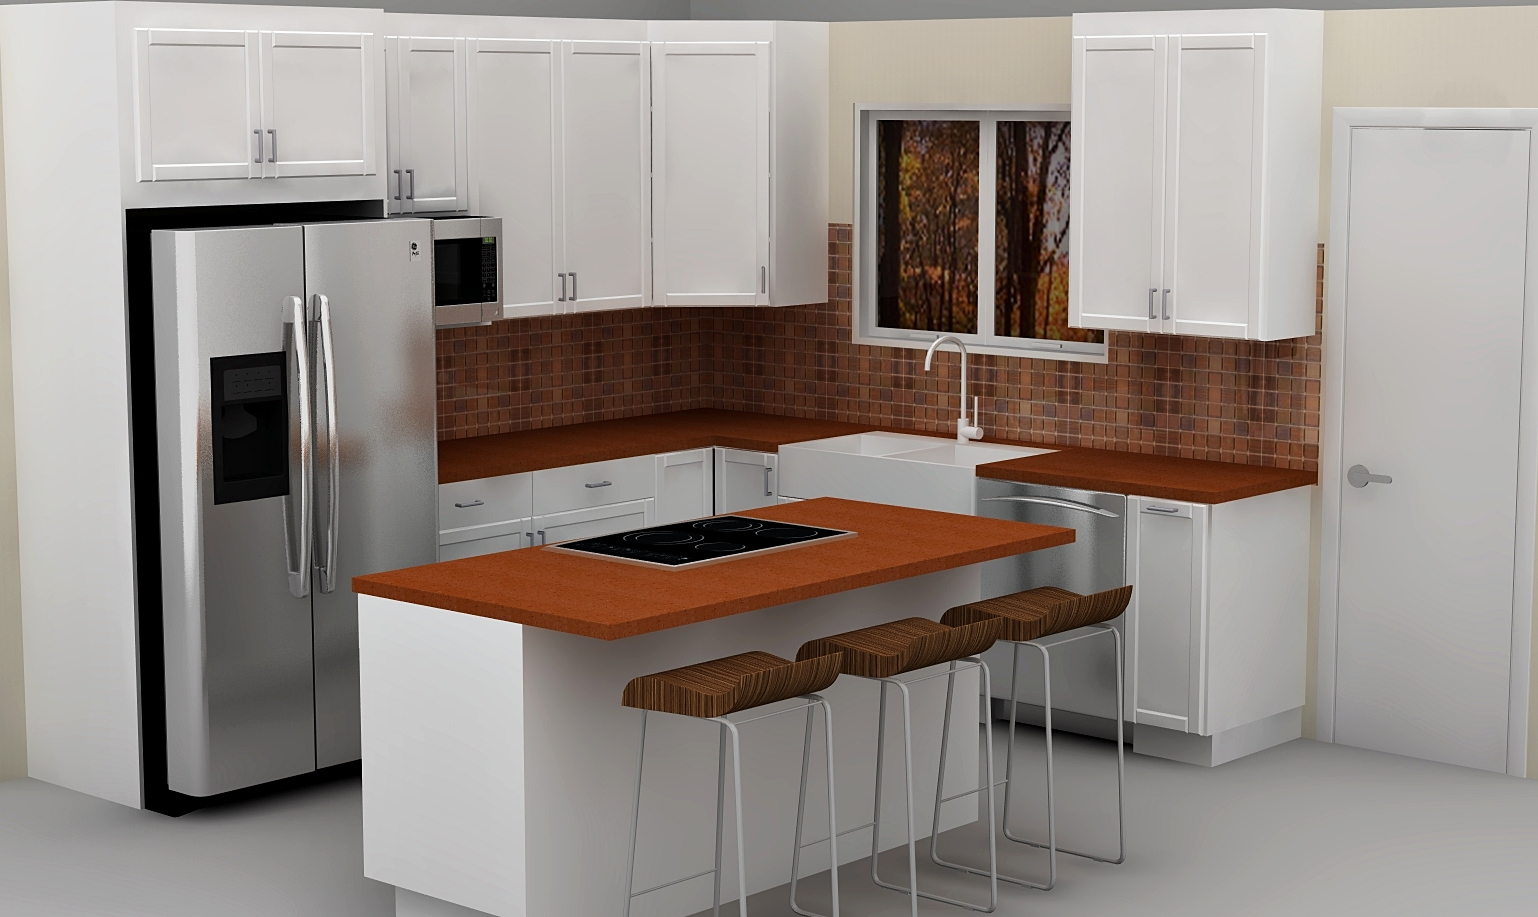 kitchen furniture ikea travertine tile for backsplash in options of cabinets custom home design